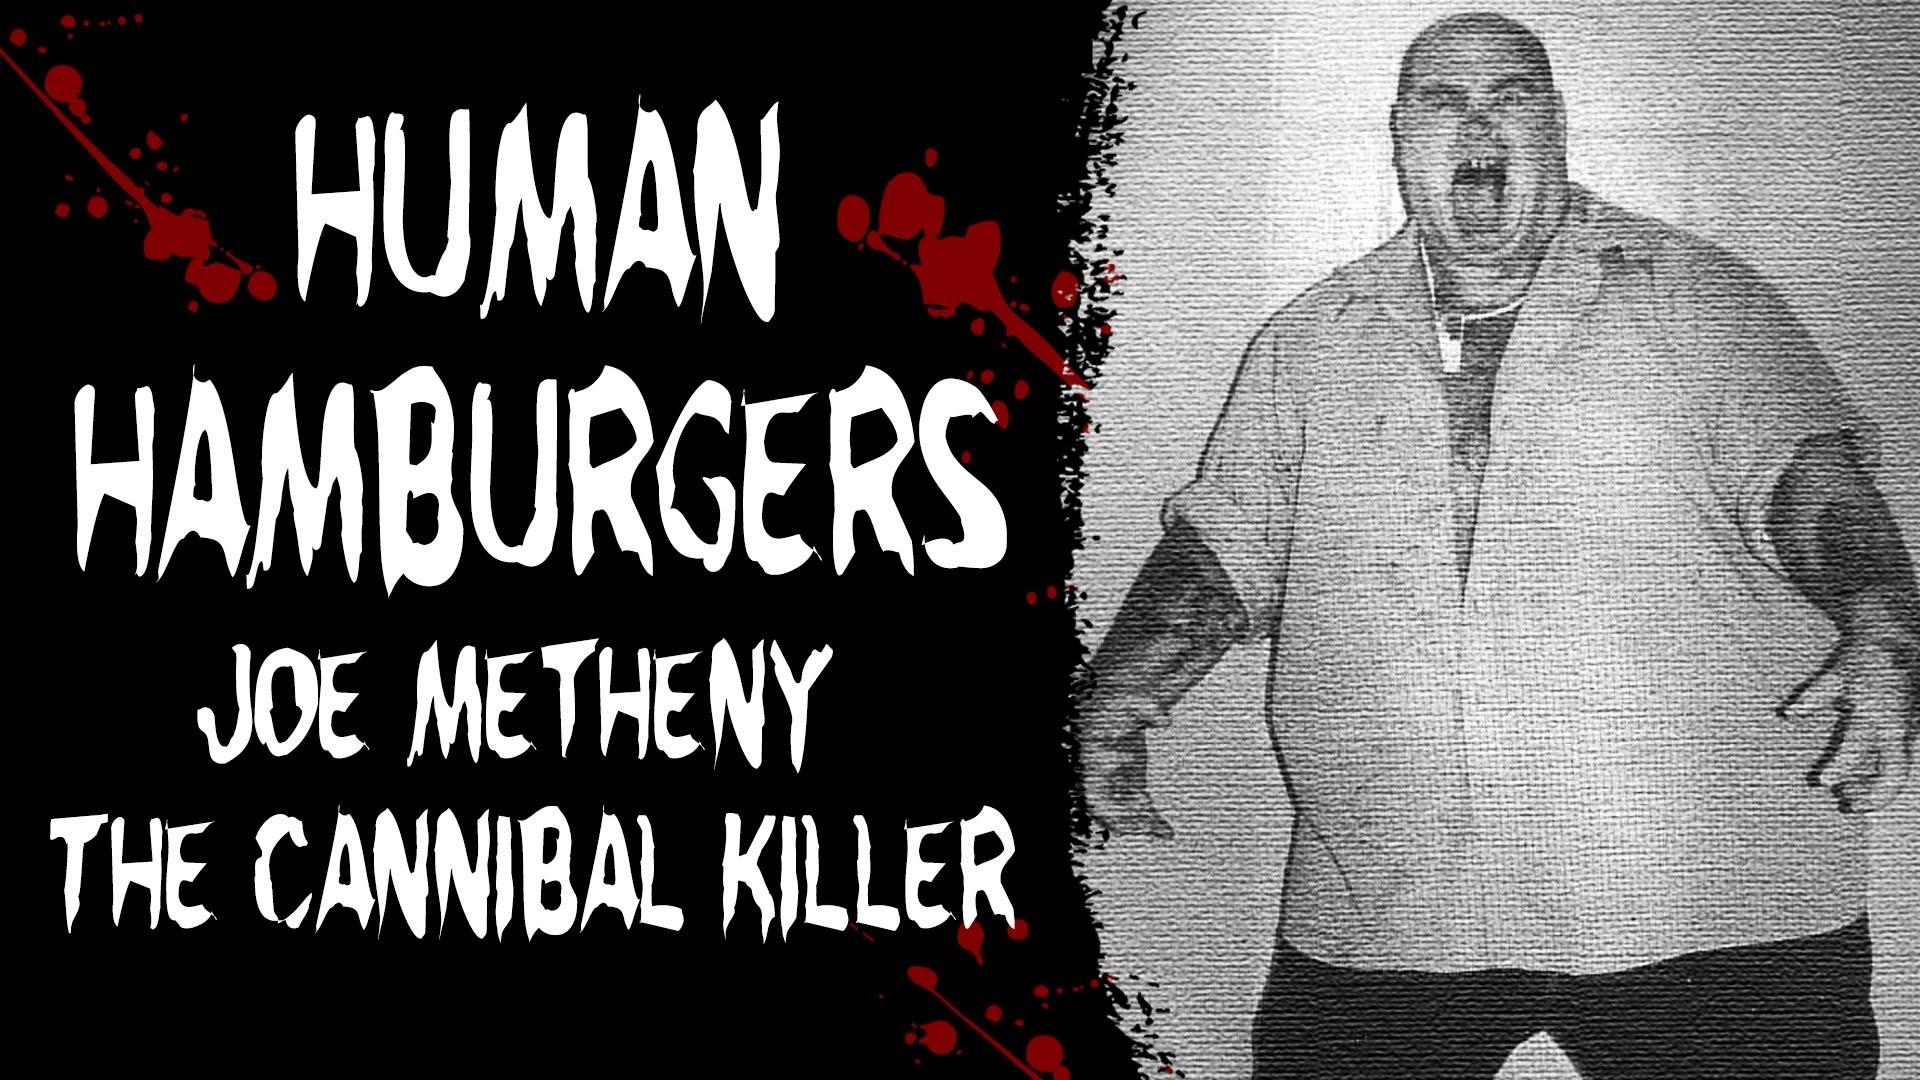 TERRIFYING TRUE STORIES: THE DISTURBING SERIAL KILLER WHO SOLD HUMAN  HAMBURGERS – Cannibal Killer – YouTube